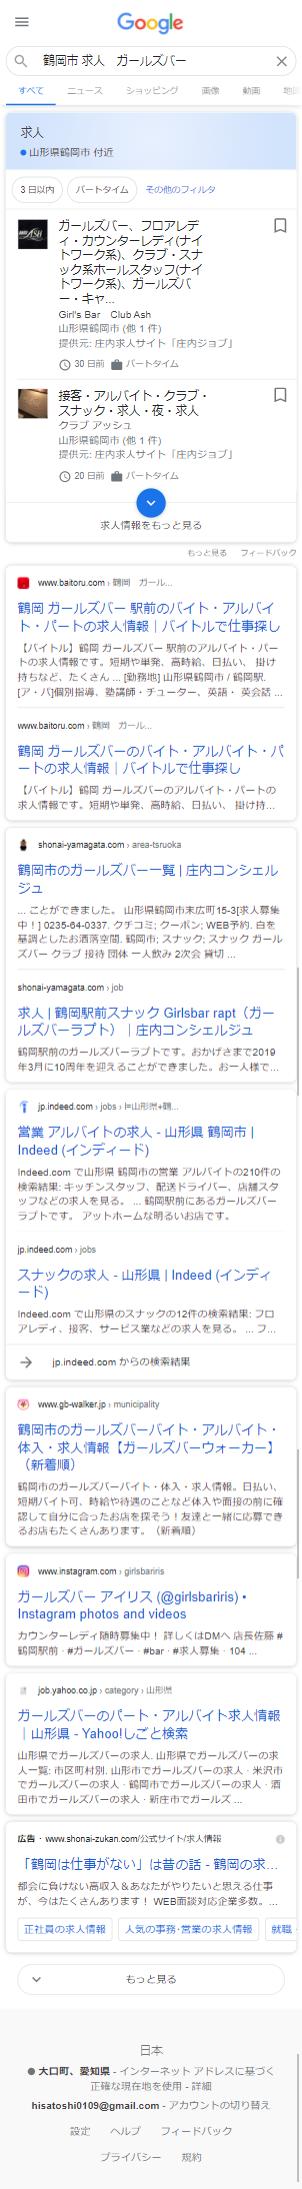 google仕事ジョブ検索結果